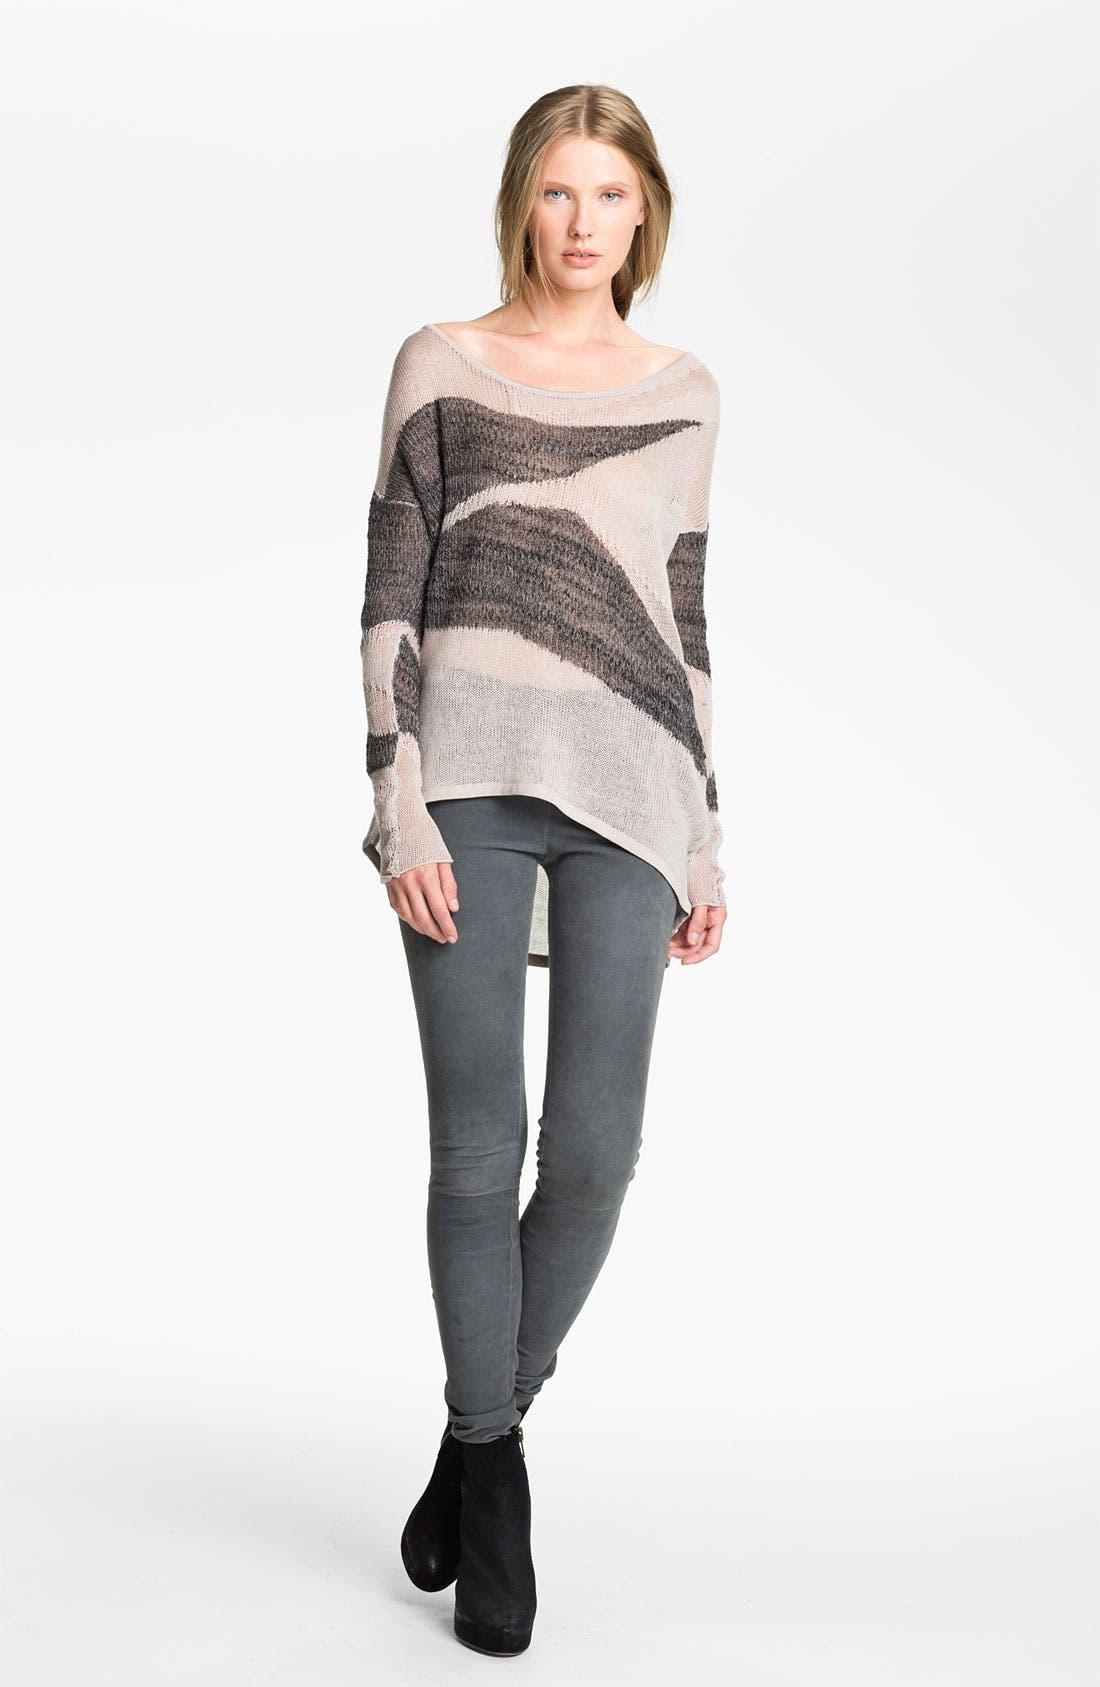 Alternate Image 1 Selected - Helmut Lang 'Merging Texture' Sweater